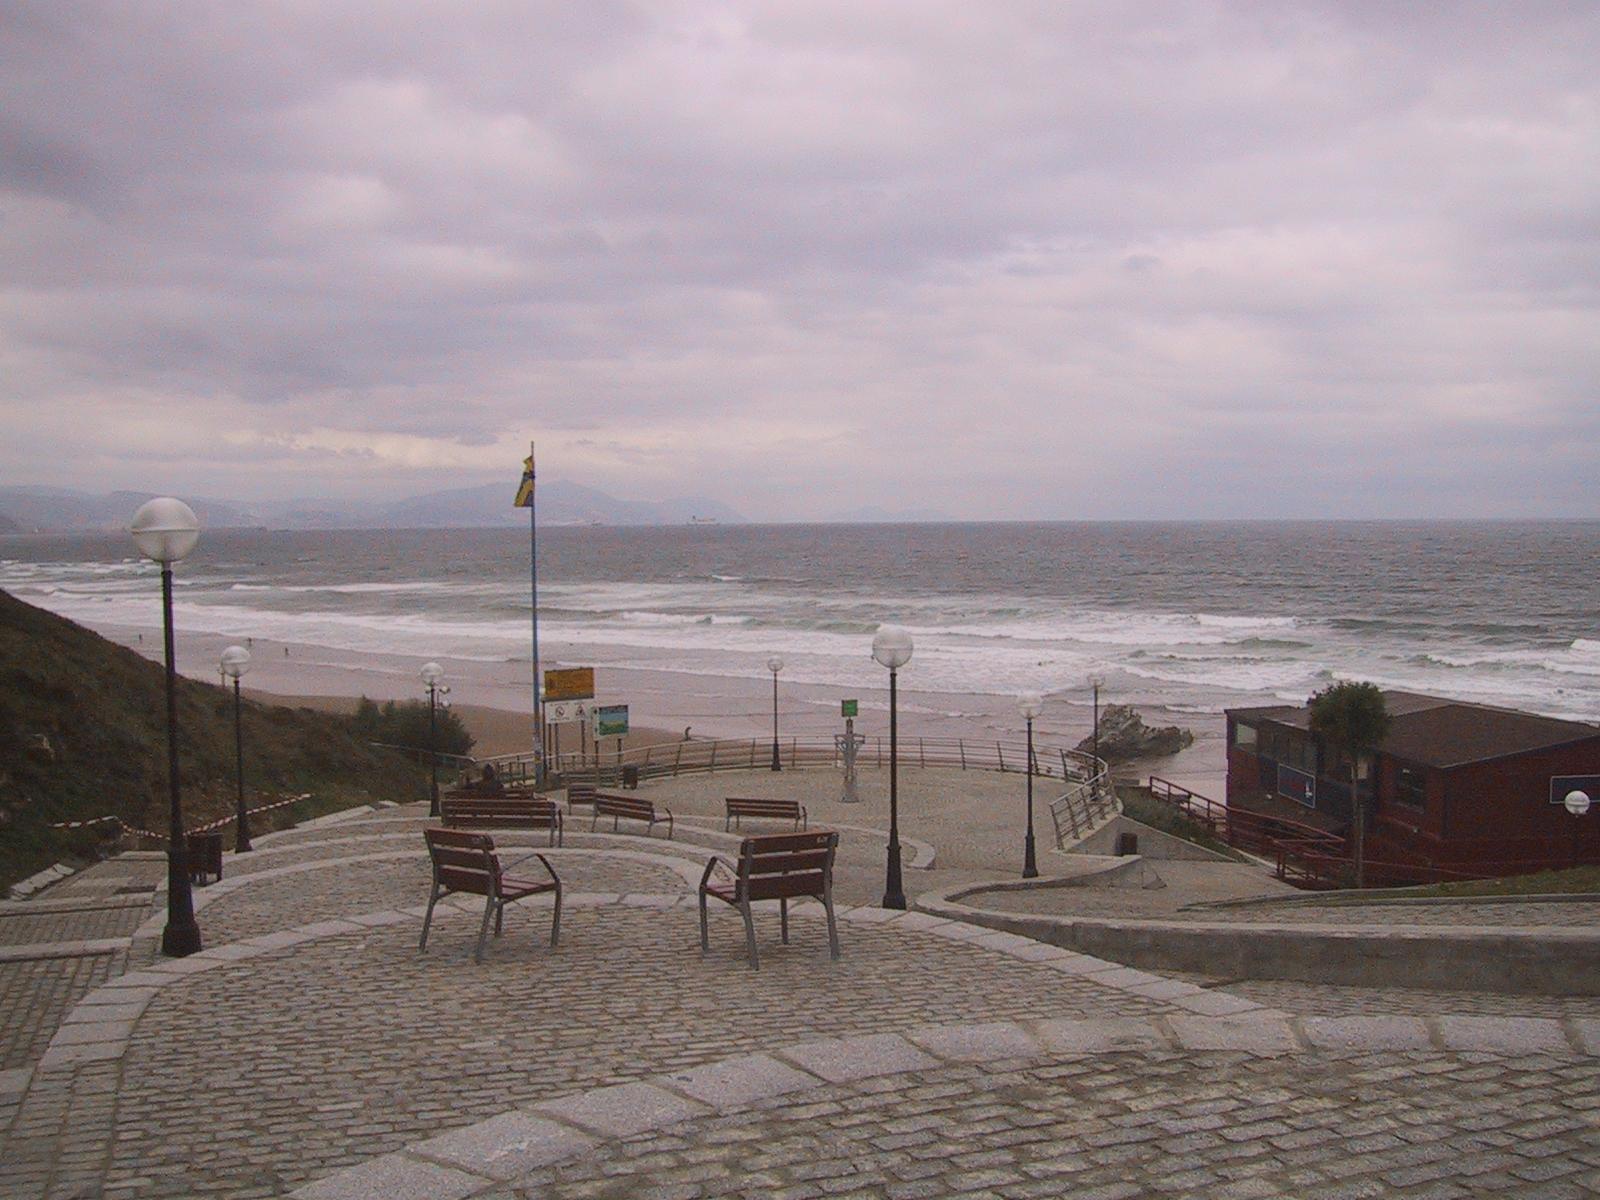 Foto playa Meñakoz. Bajada a playa Arrietara (Sopelana) Bizkaia